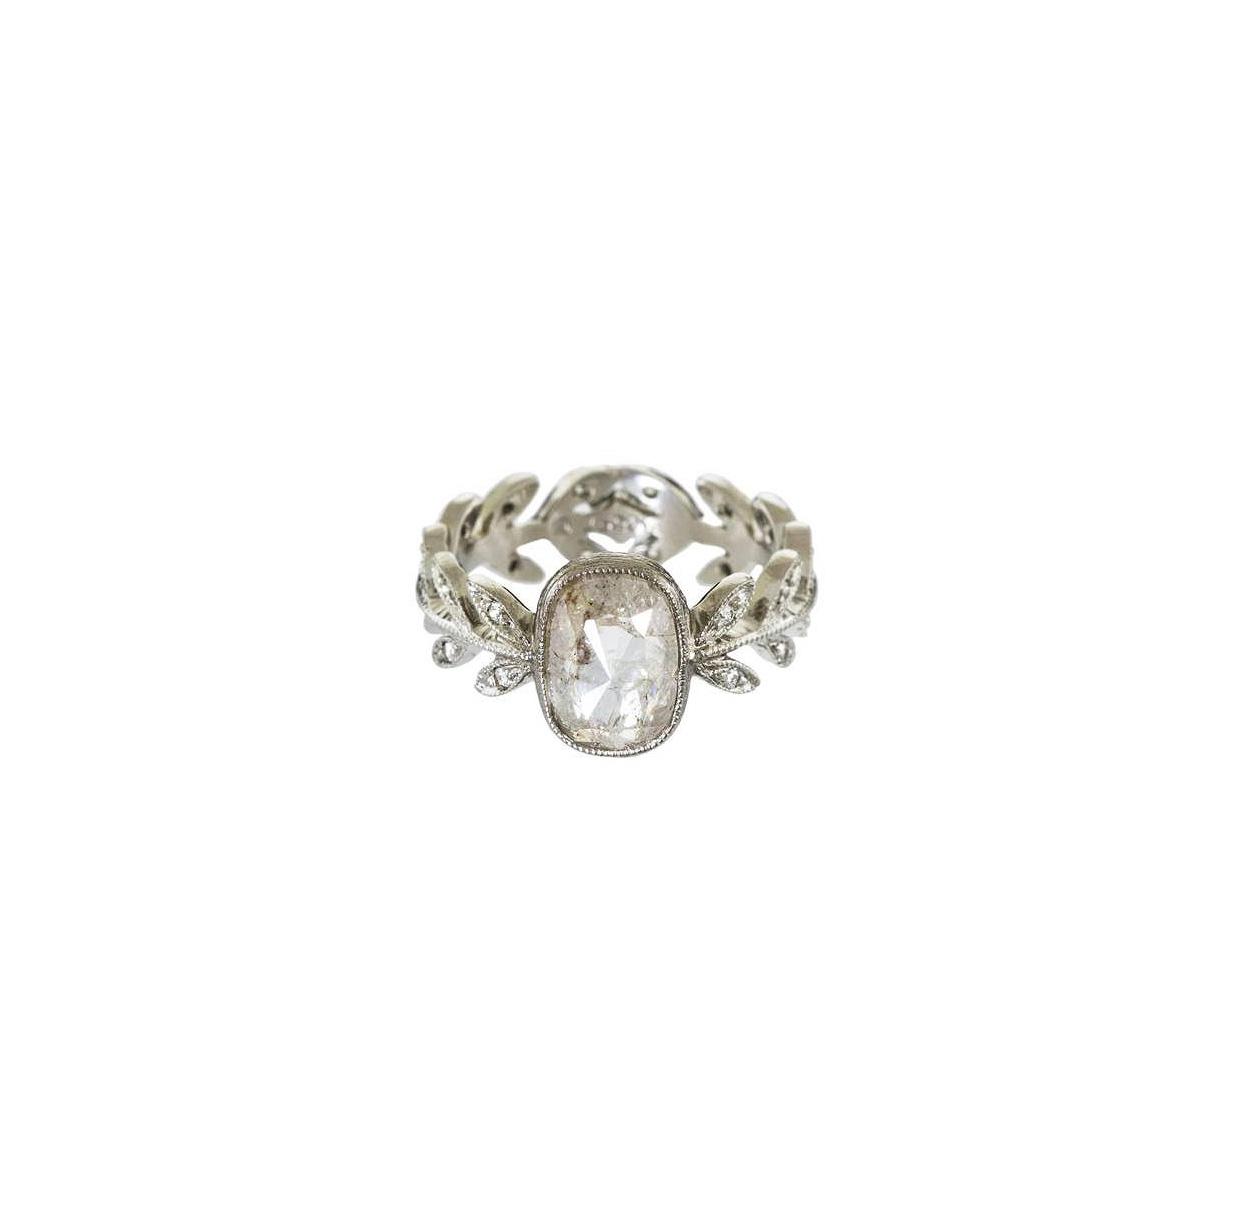 cathy waterman cushion cut diamond engagement ring floral band